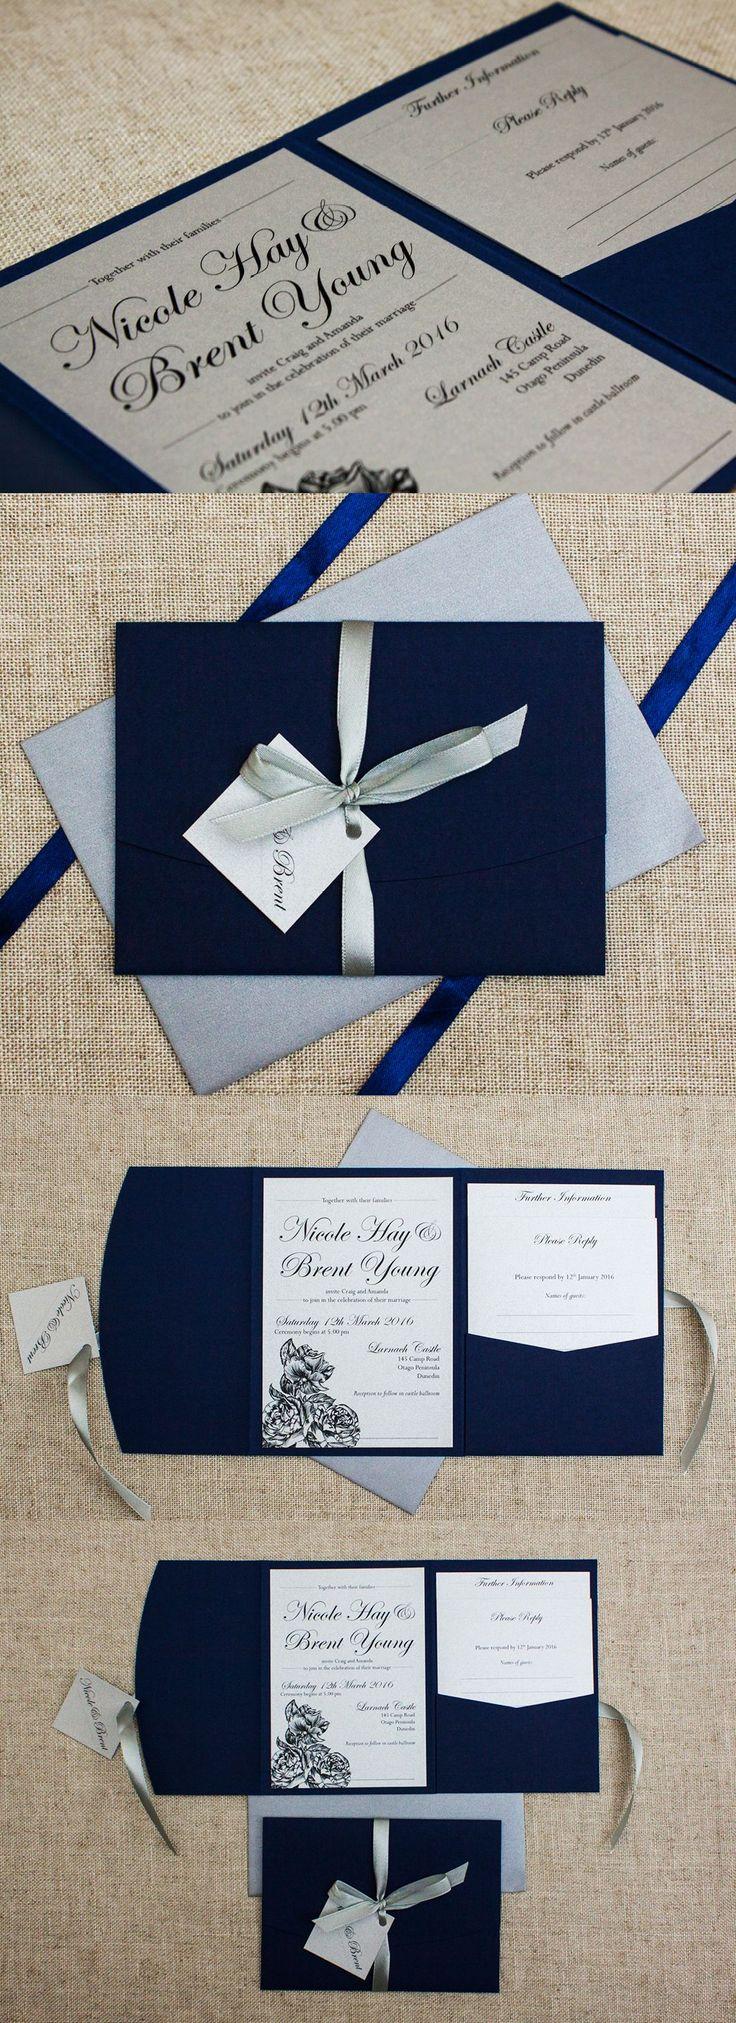 Elegant Navy Blue and Silver Wedding Invitation